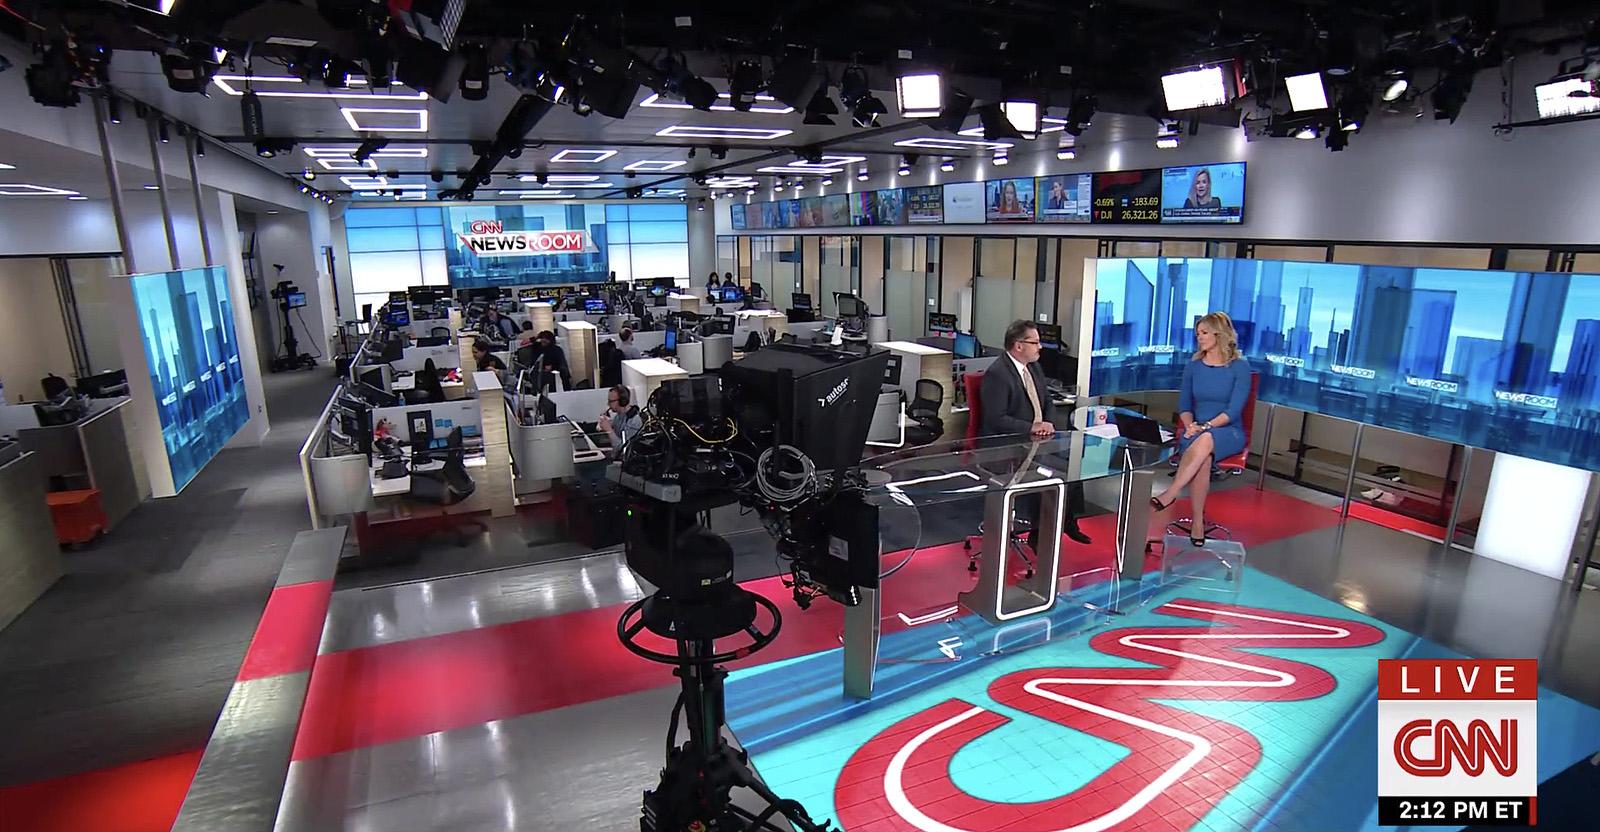 Cnn Studio 17n Broadcast Set Design Gallery